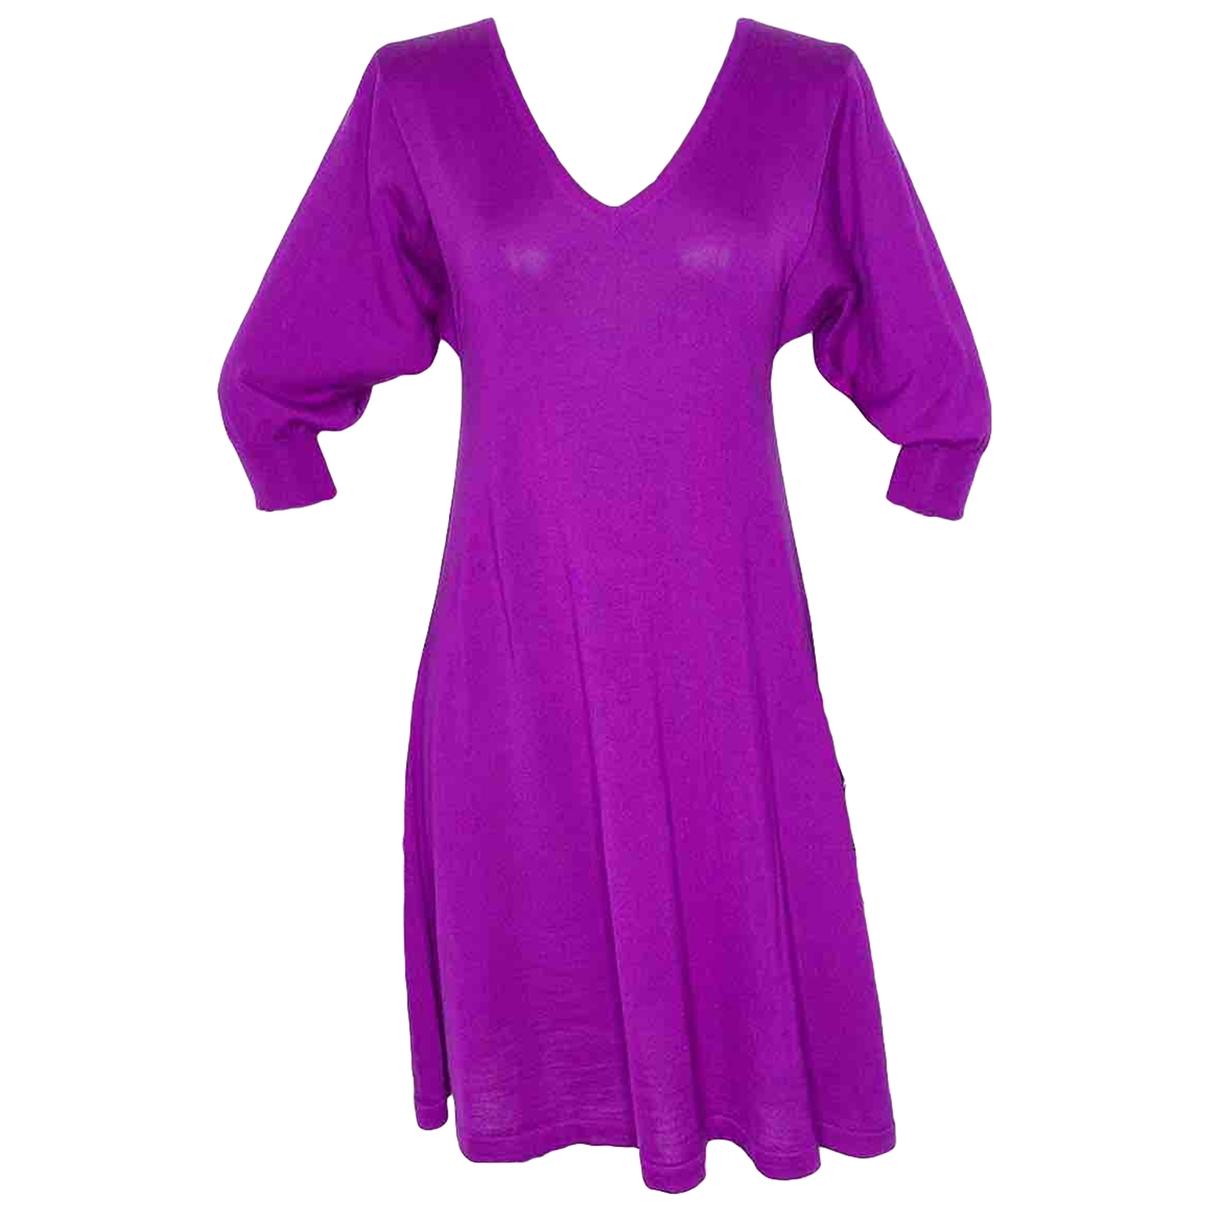 Balenciaga \N Kleid in  Lila Kaschmir